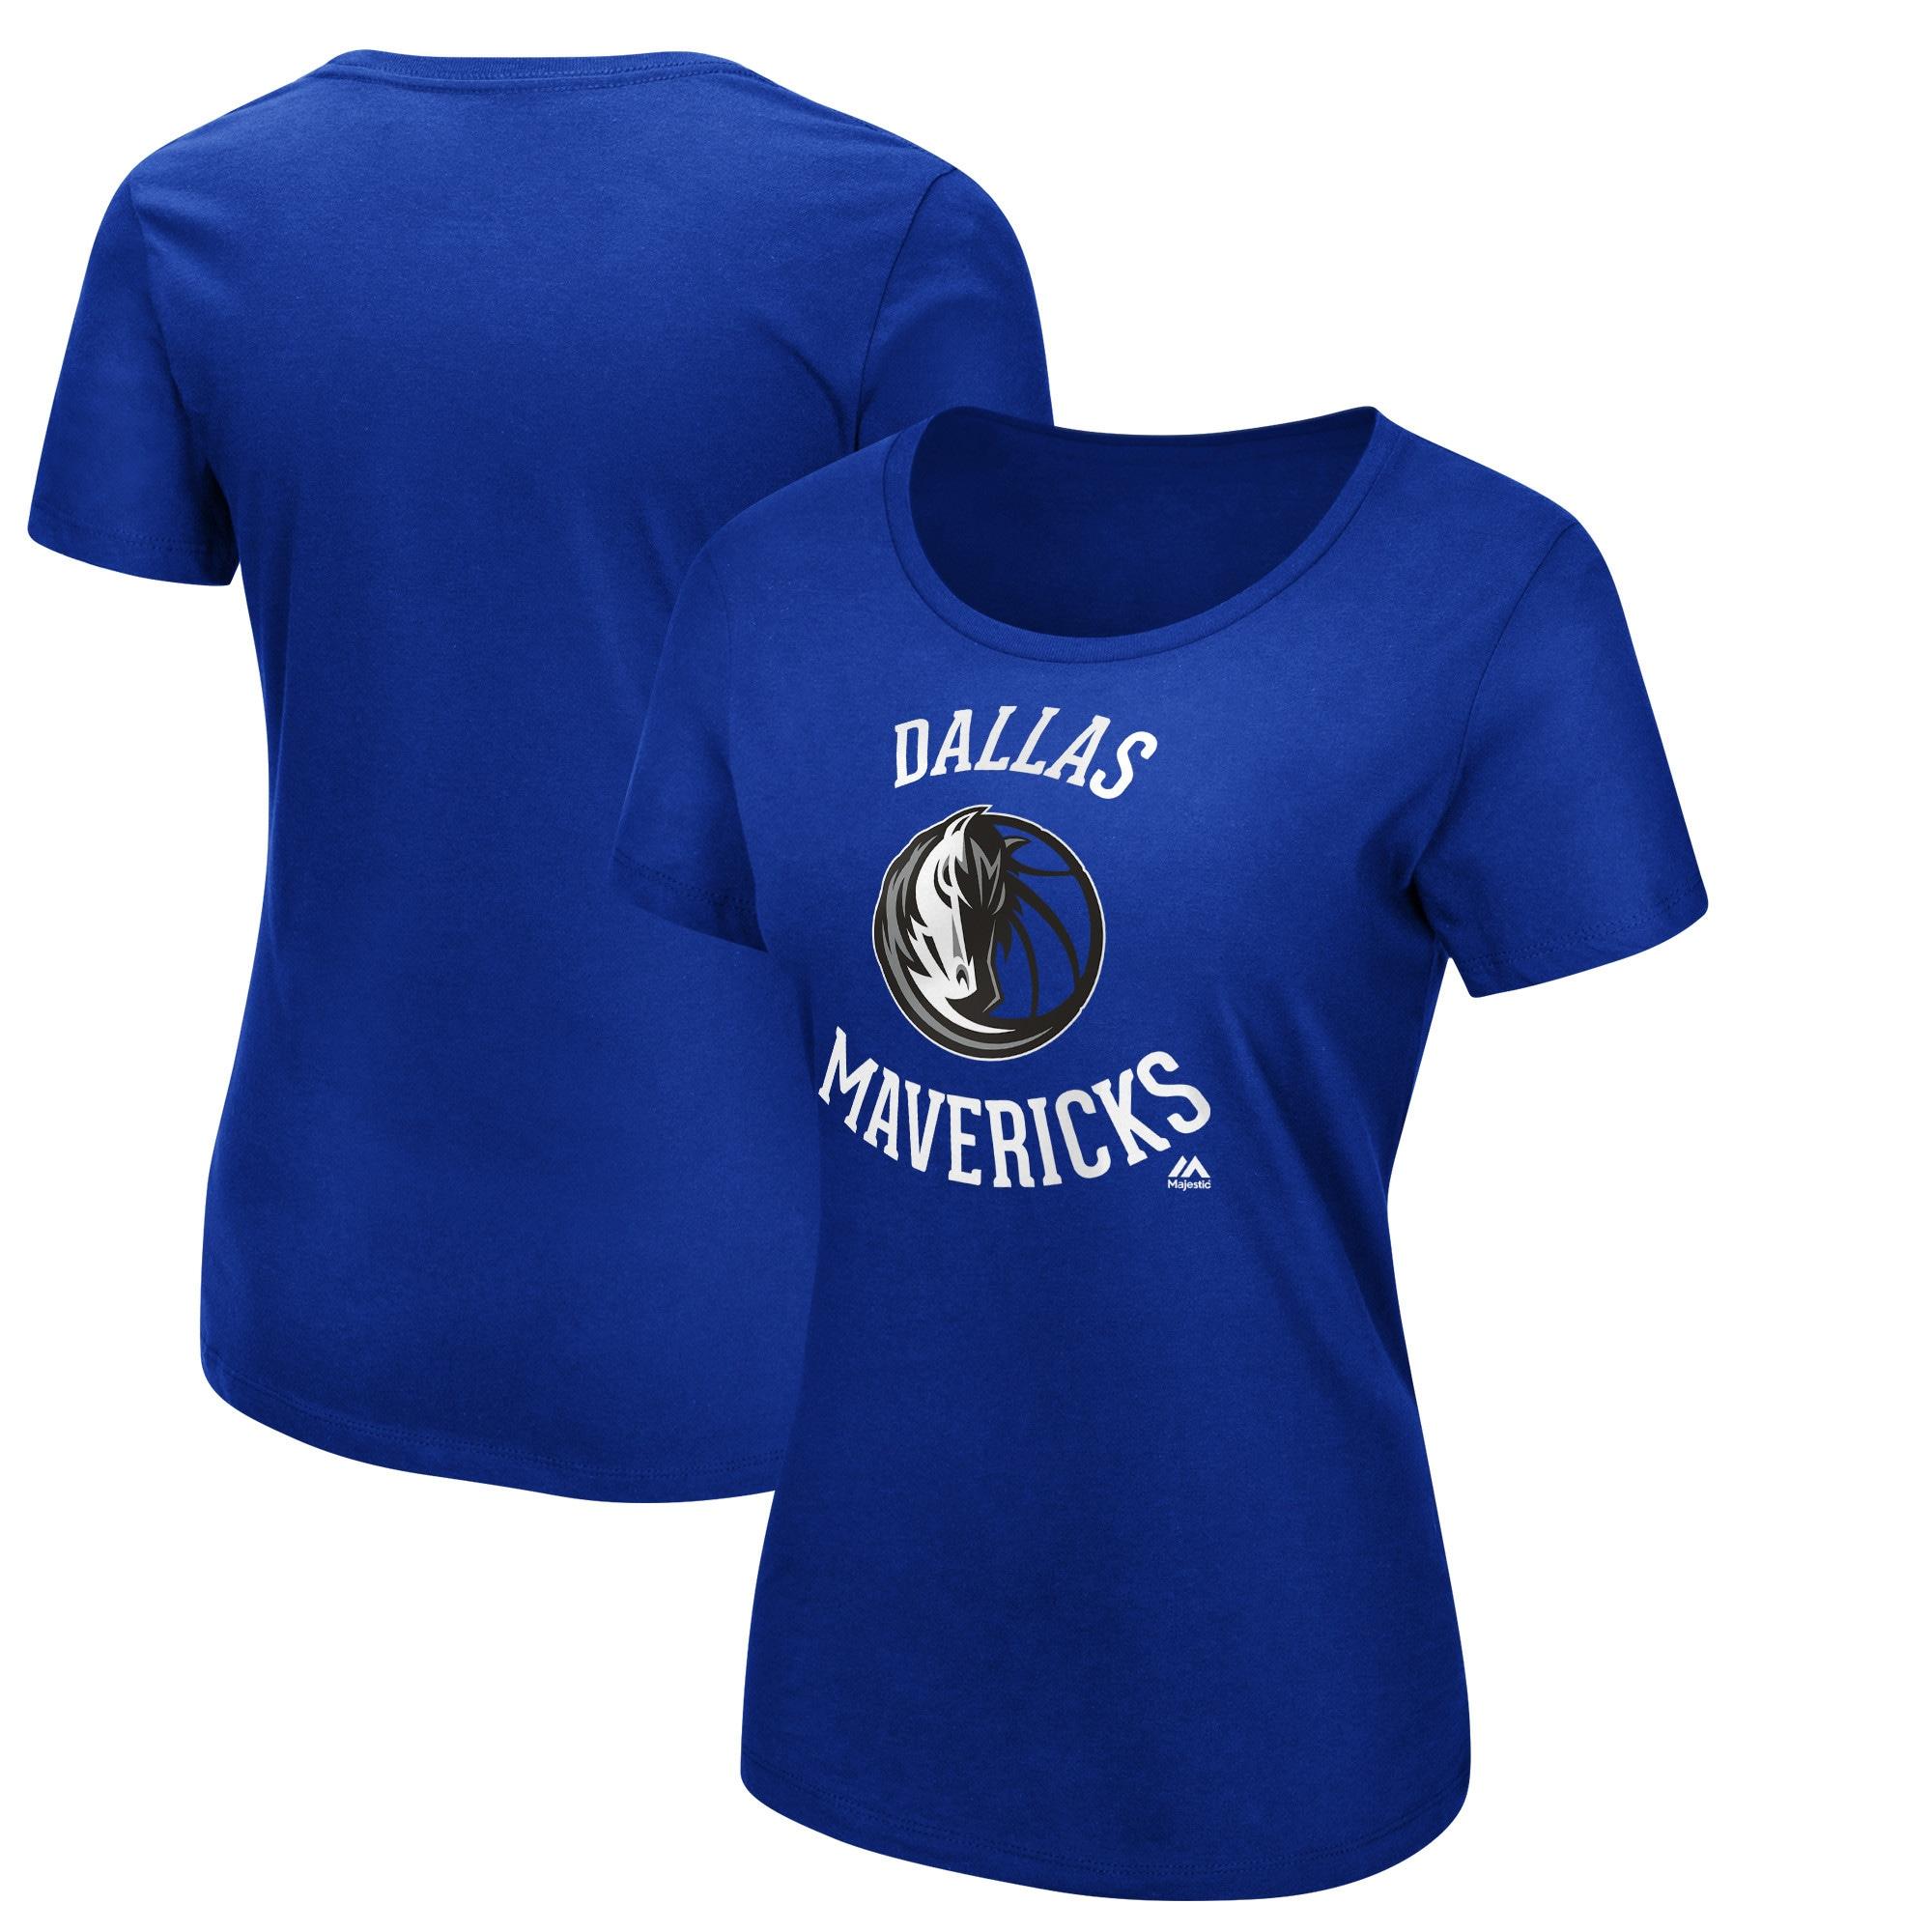 Dallas Mavericks Majestic Women's The Main Thing T-Shirt - Blue